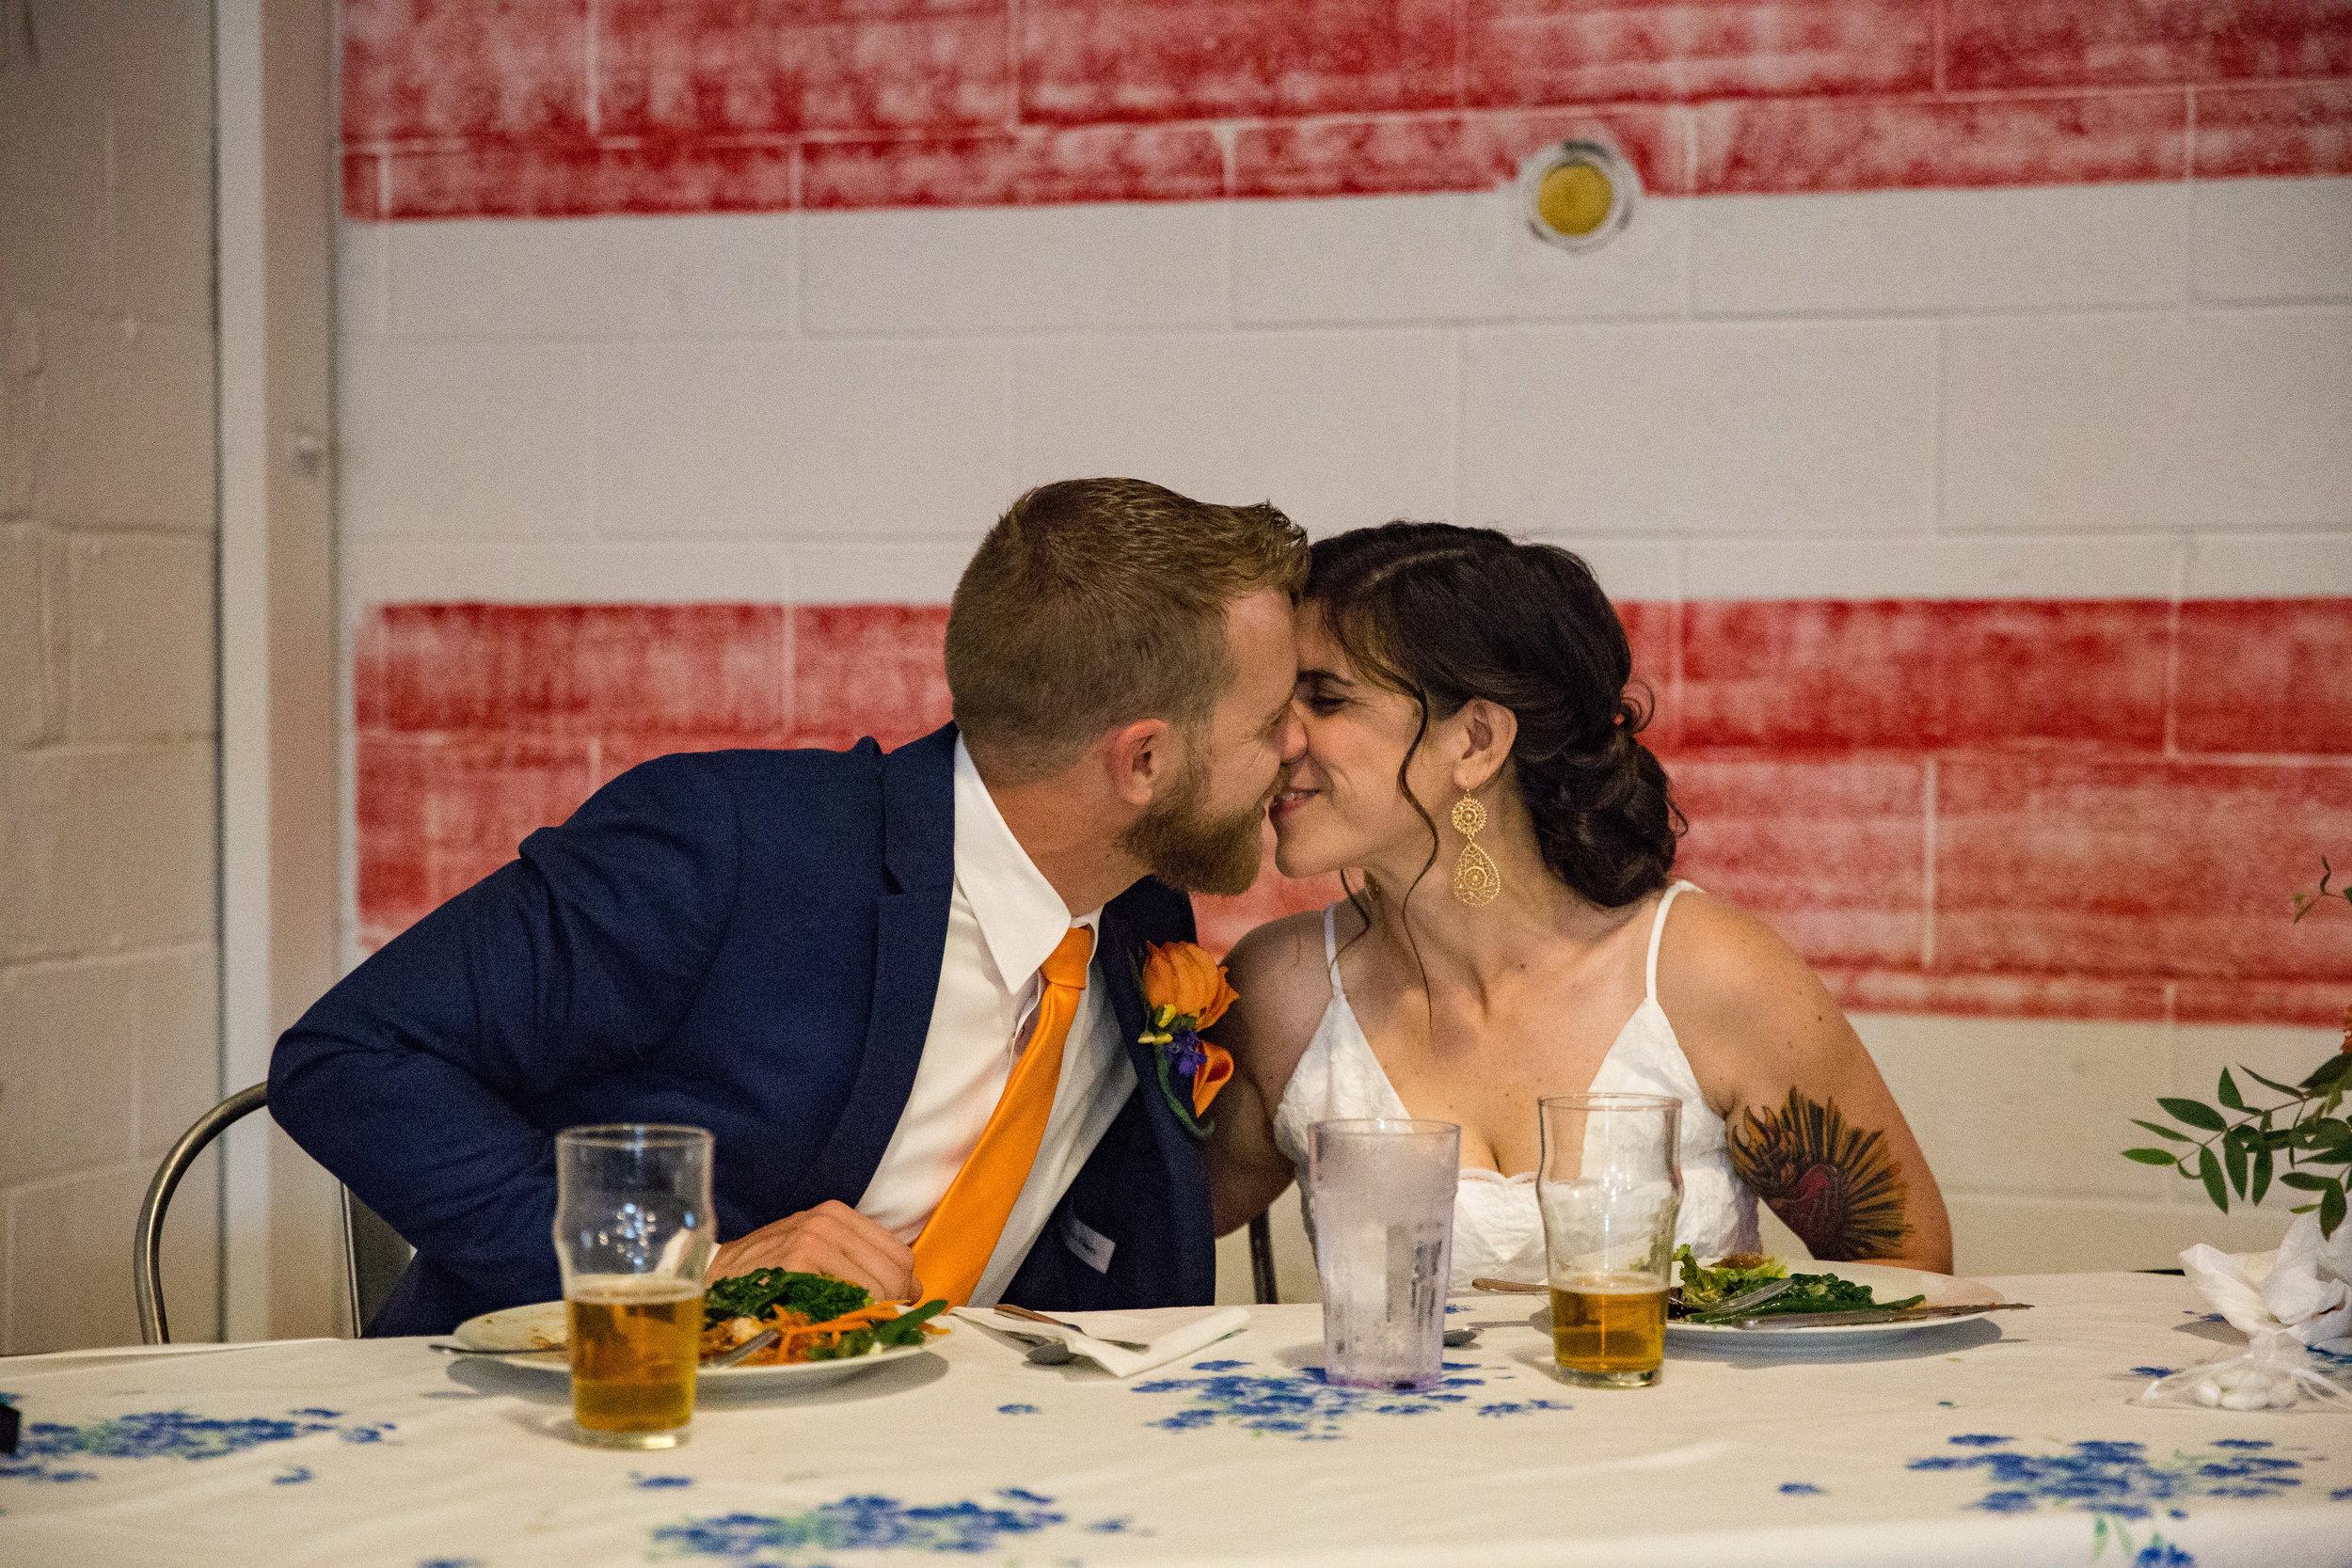 Natalie and Dallas Mooney Wedding 6-8-19_Tania Watt Photography-501.jpg